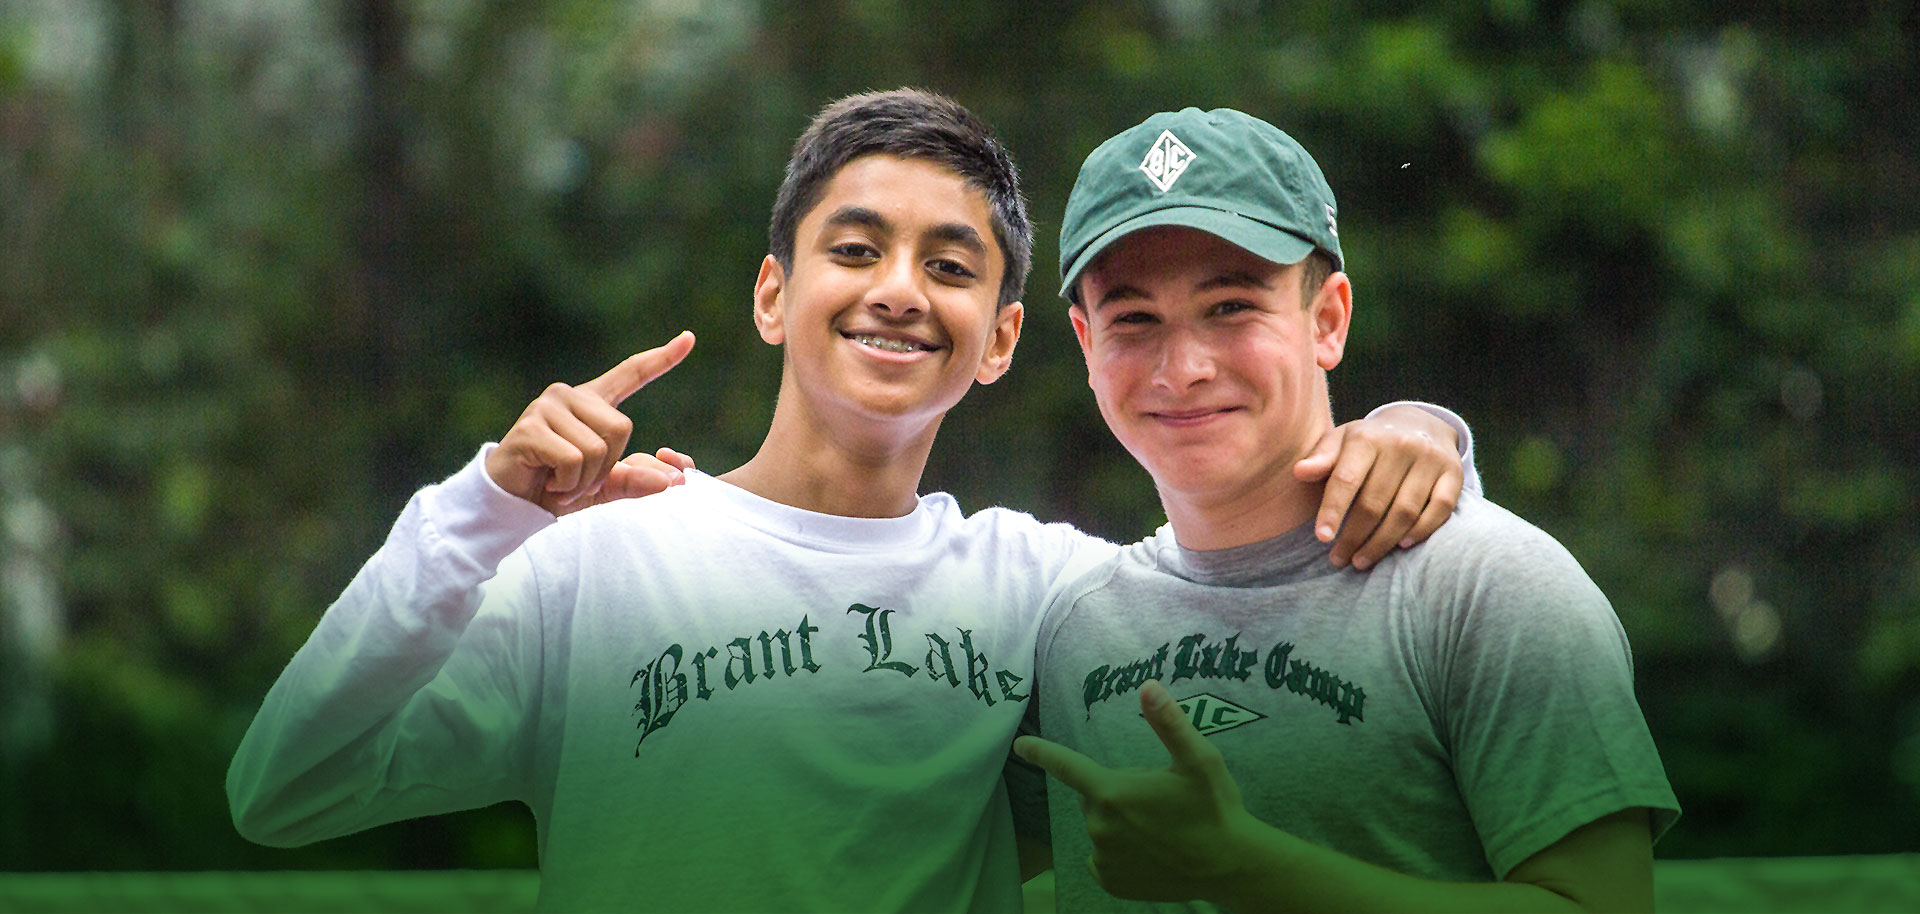 Brant Lake Camp Gear